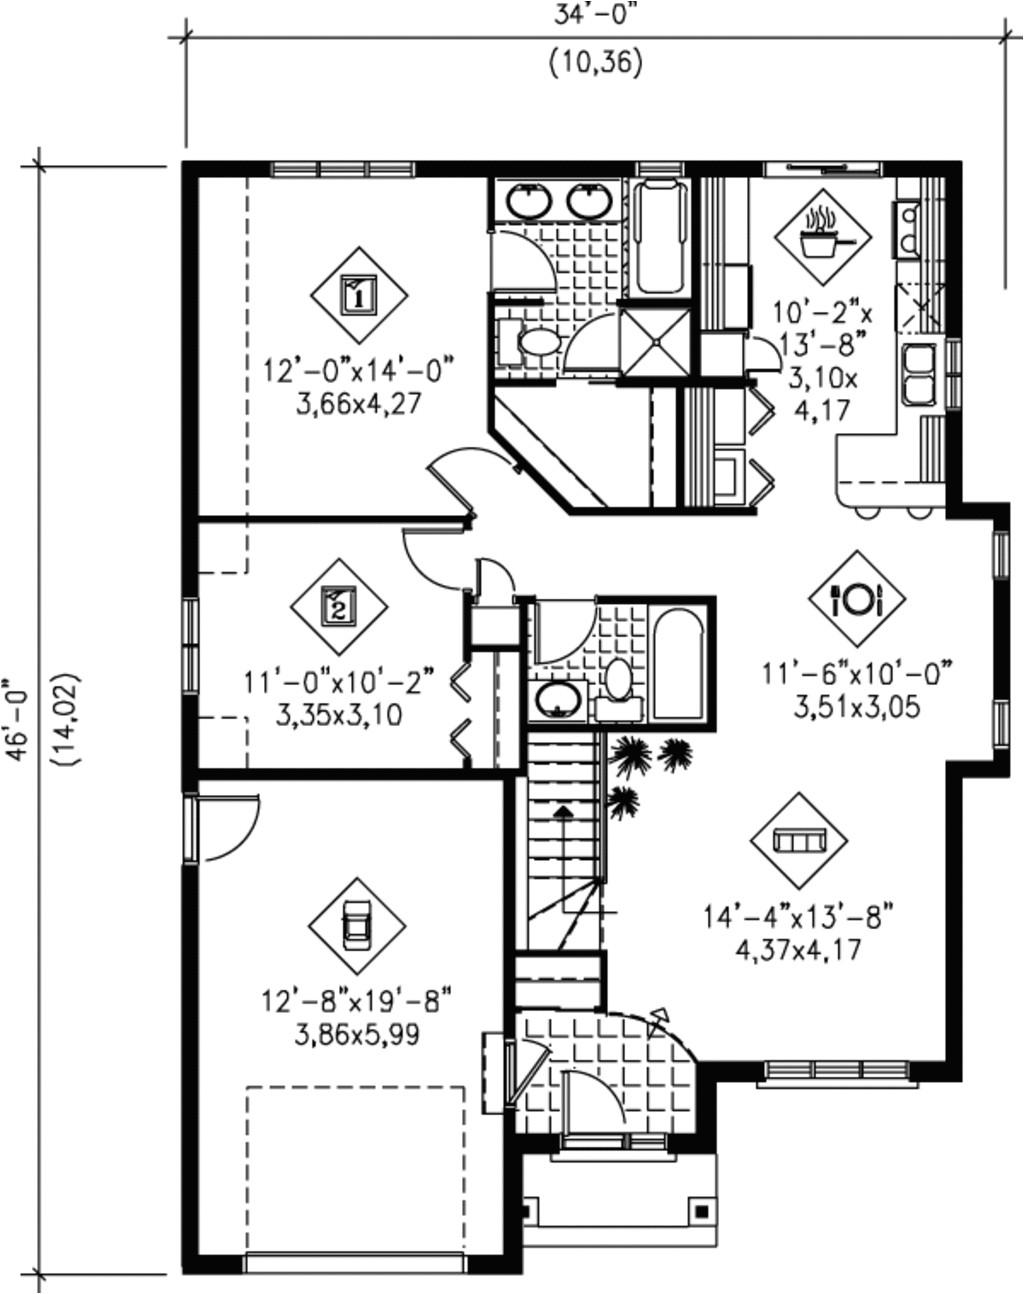 1100 square feet 2 bedrooms 2 bathroom european house plans 1 garage 1519